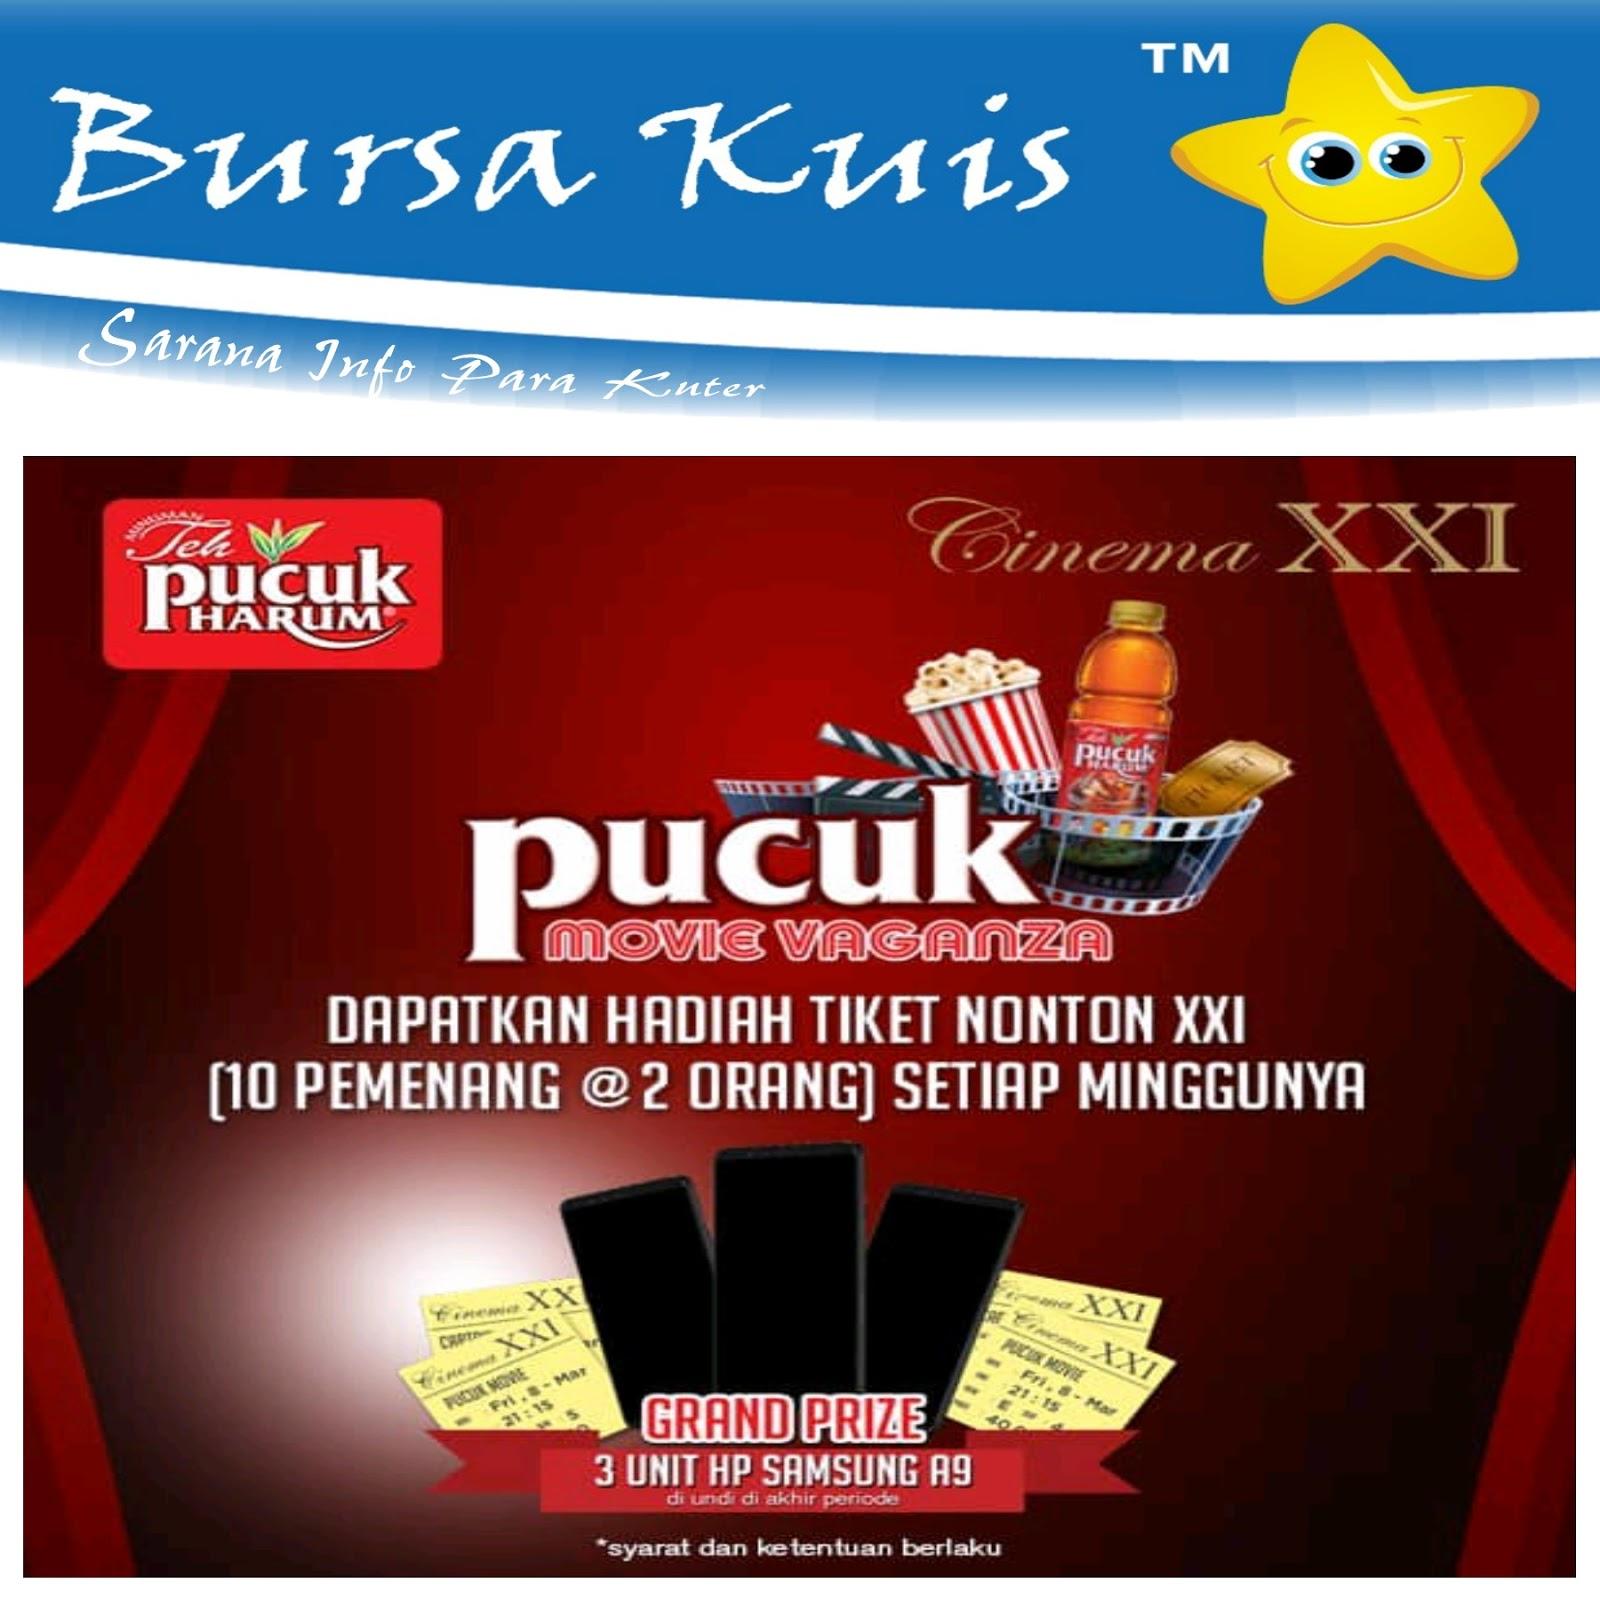 Kuis Teh Pucuk Movie Vaganza Berhadiah Samsung A9 - Kuis & Lomba ...